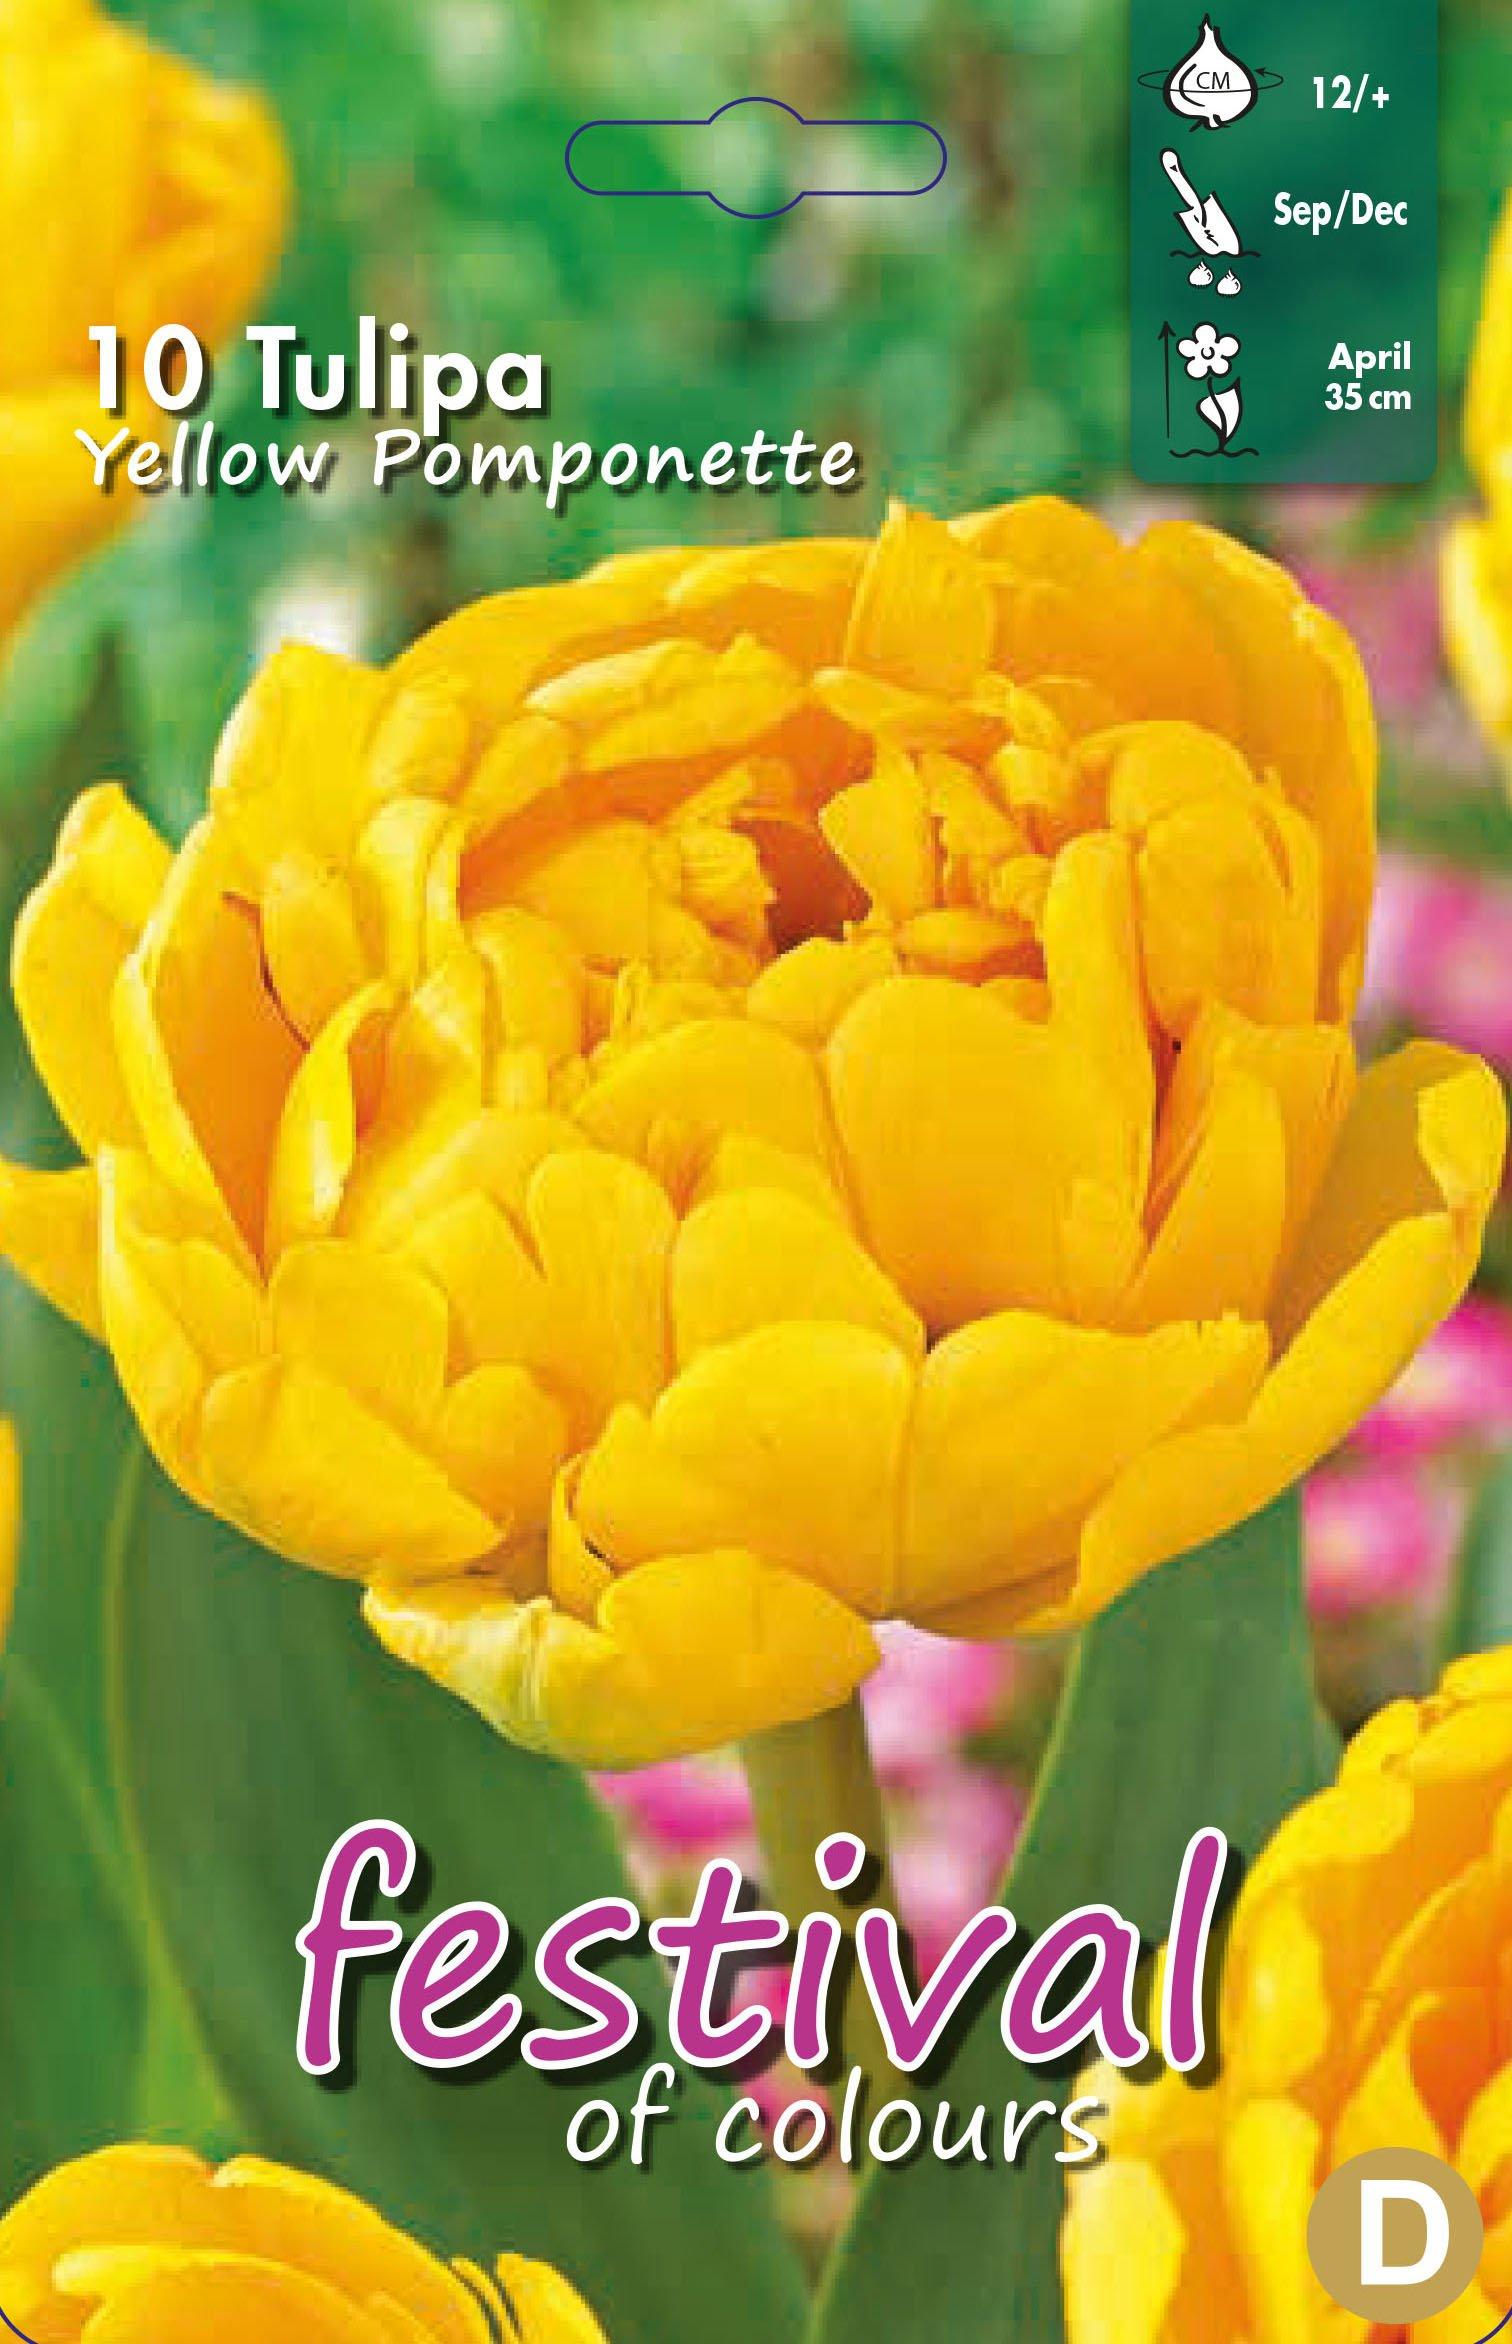 Tulipa Yellow Pomponette 10 stk